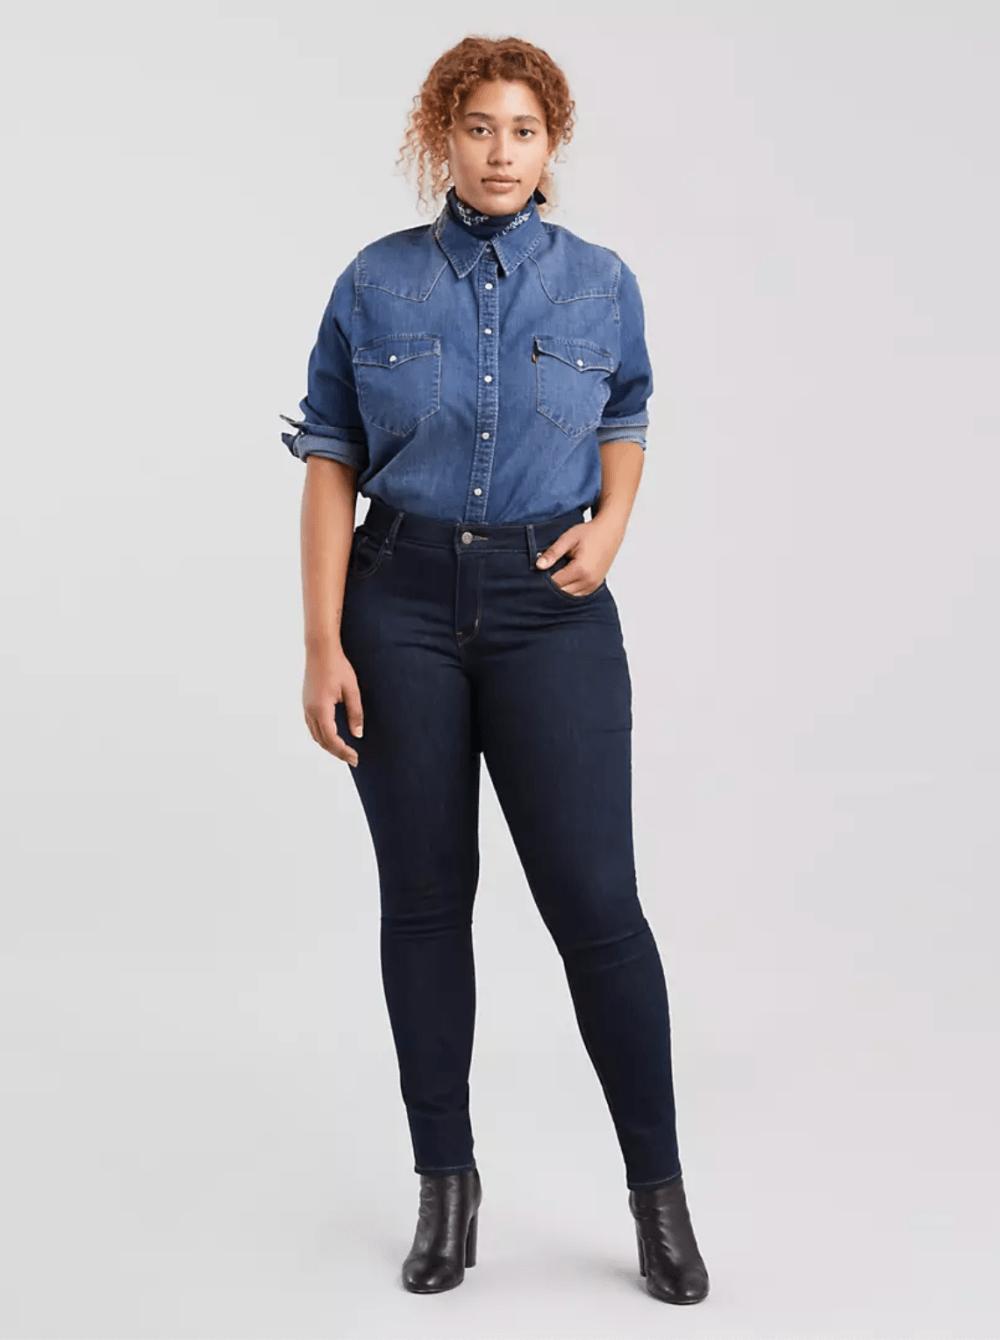 711-skinny-womens-jeans-plus-size